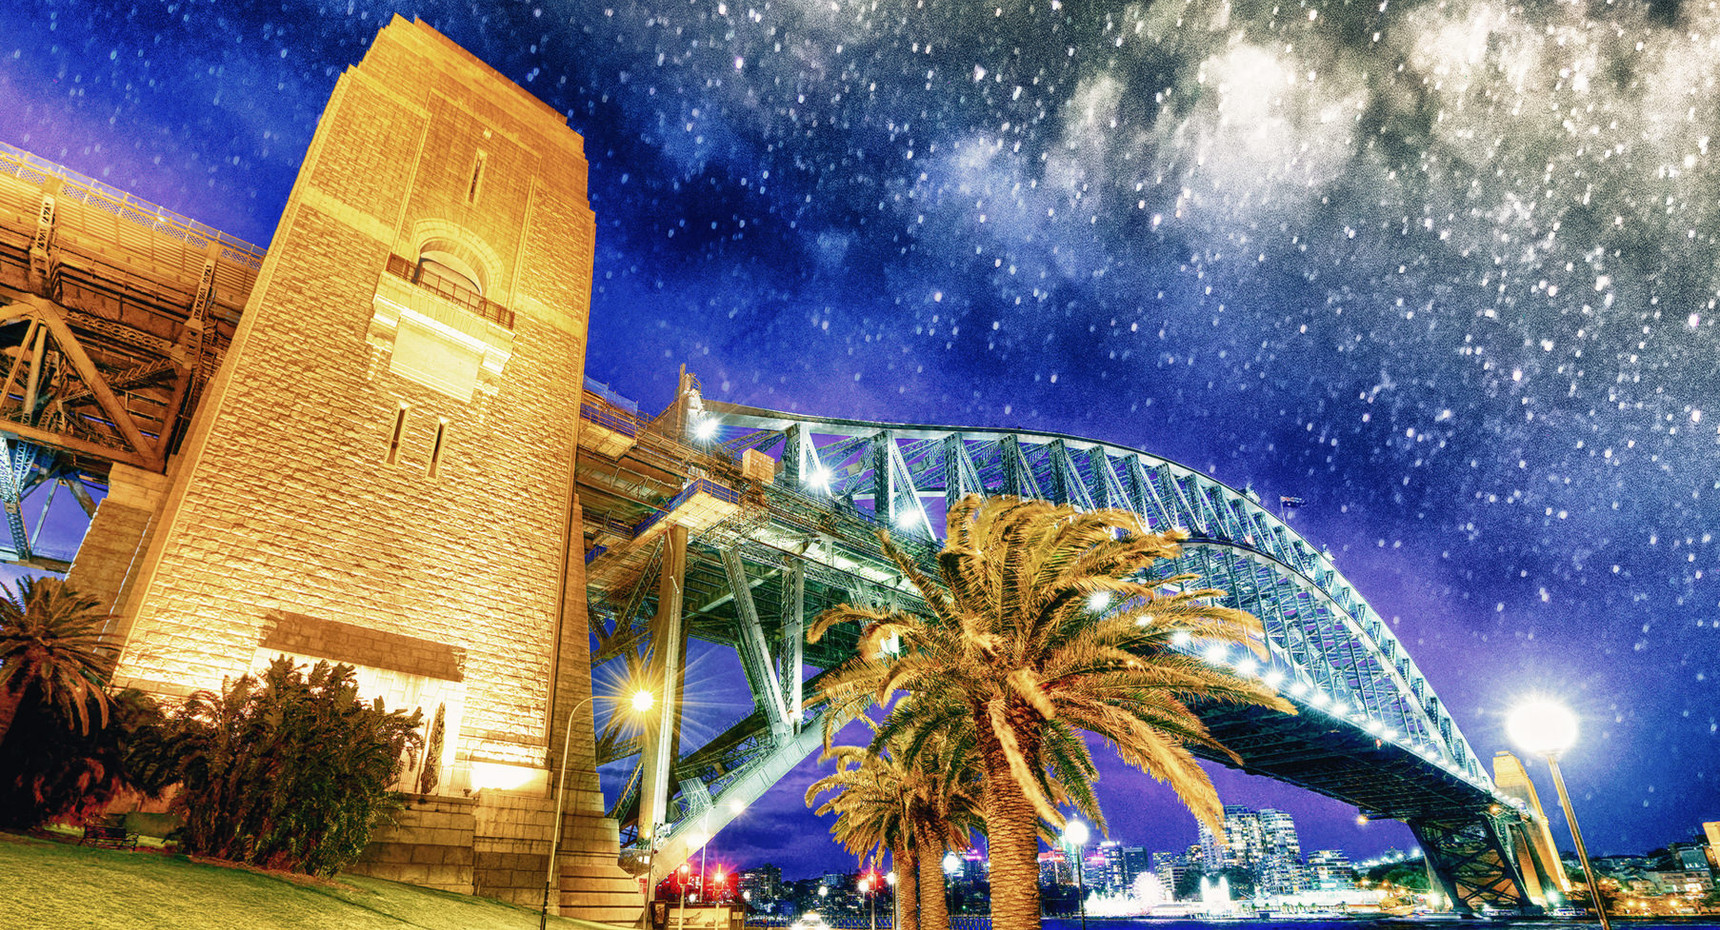 Sydney Harbor Bridge on a starry night